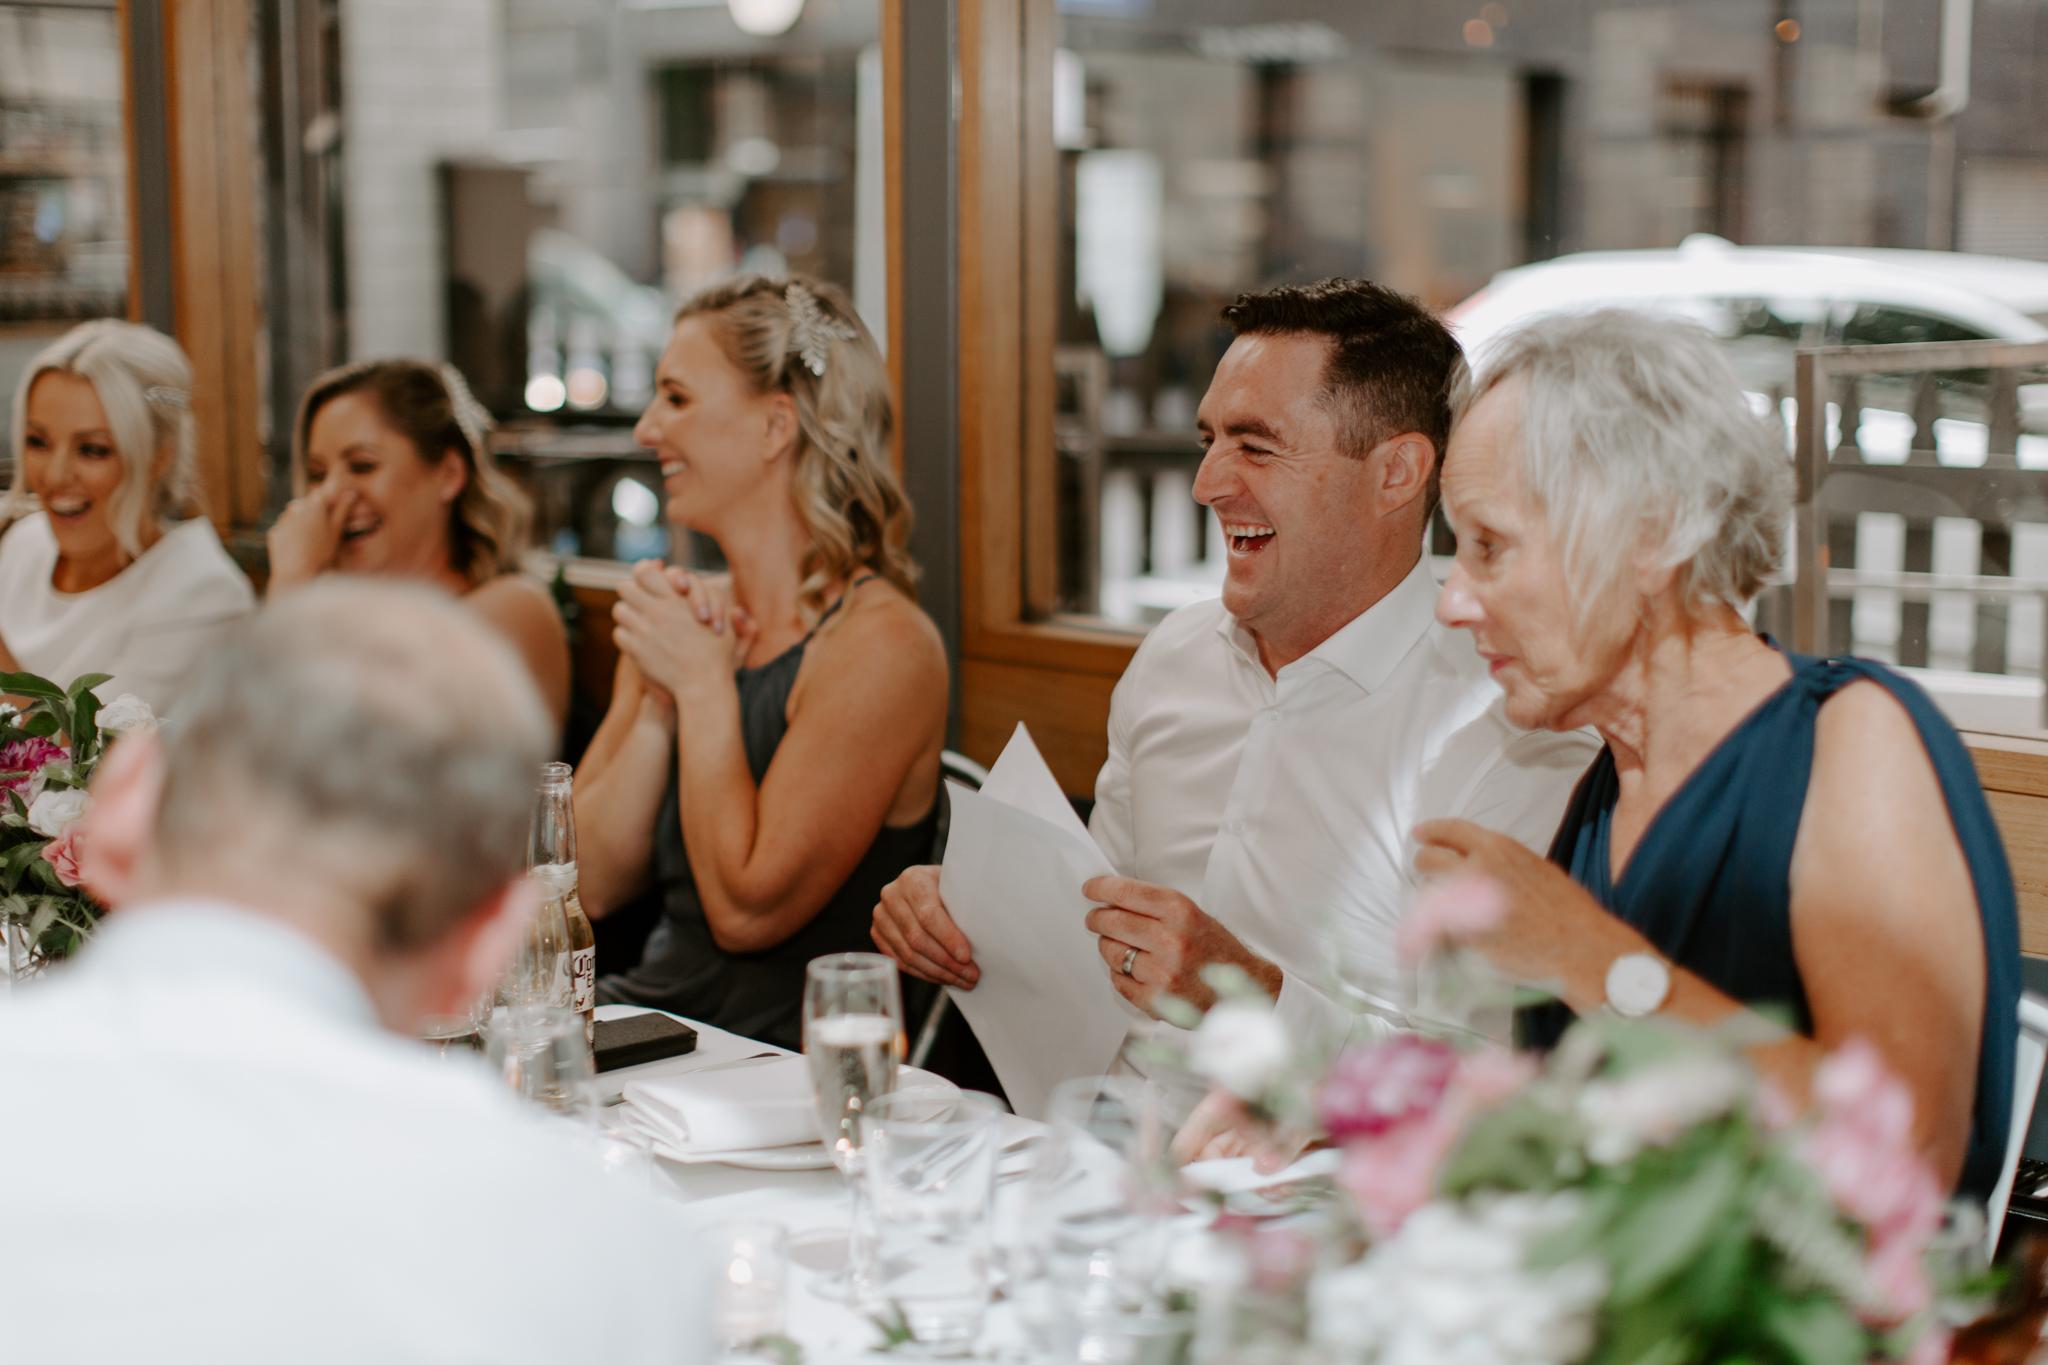 Trunk-restaurant-wedding-EmotionsandMath-076.jpg